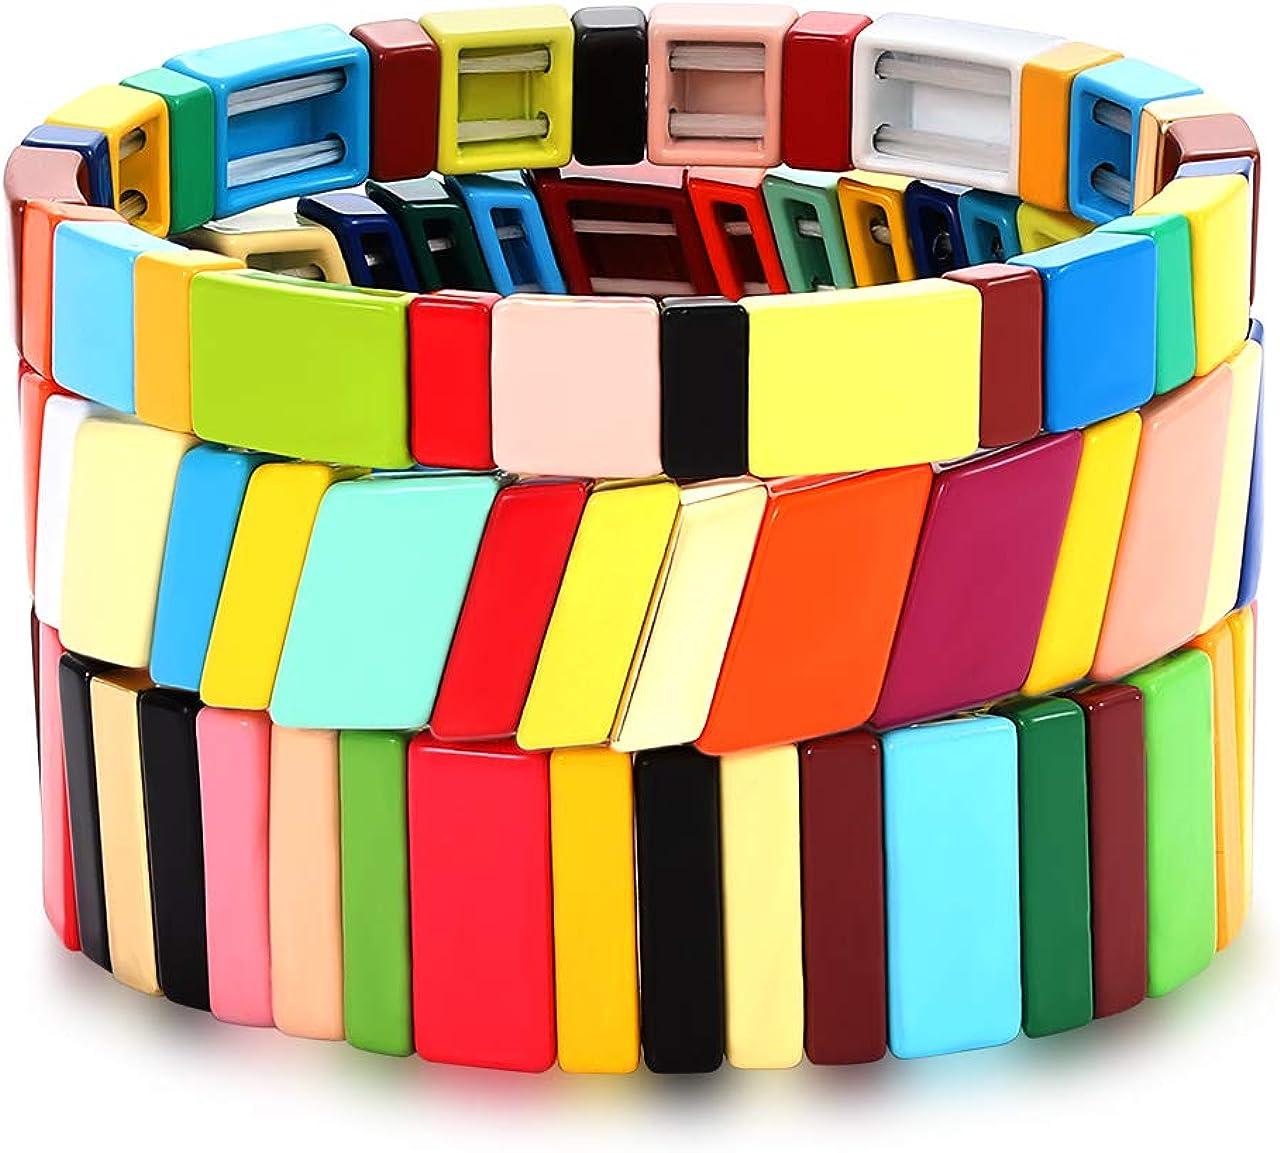 NVENF Tile Bracelets Enamel Rainbow Tile Bead Bracelets Colorblock Stackable Stretch Bracelets Bohemia Tile Strand Bangle Bracelet Set for Women Men Girls